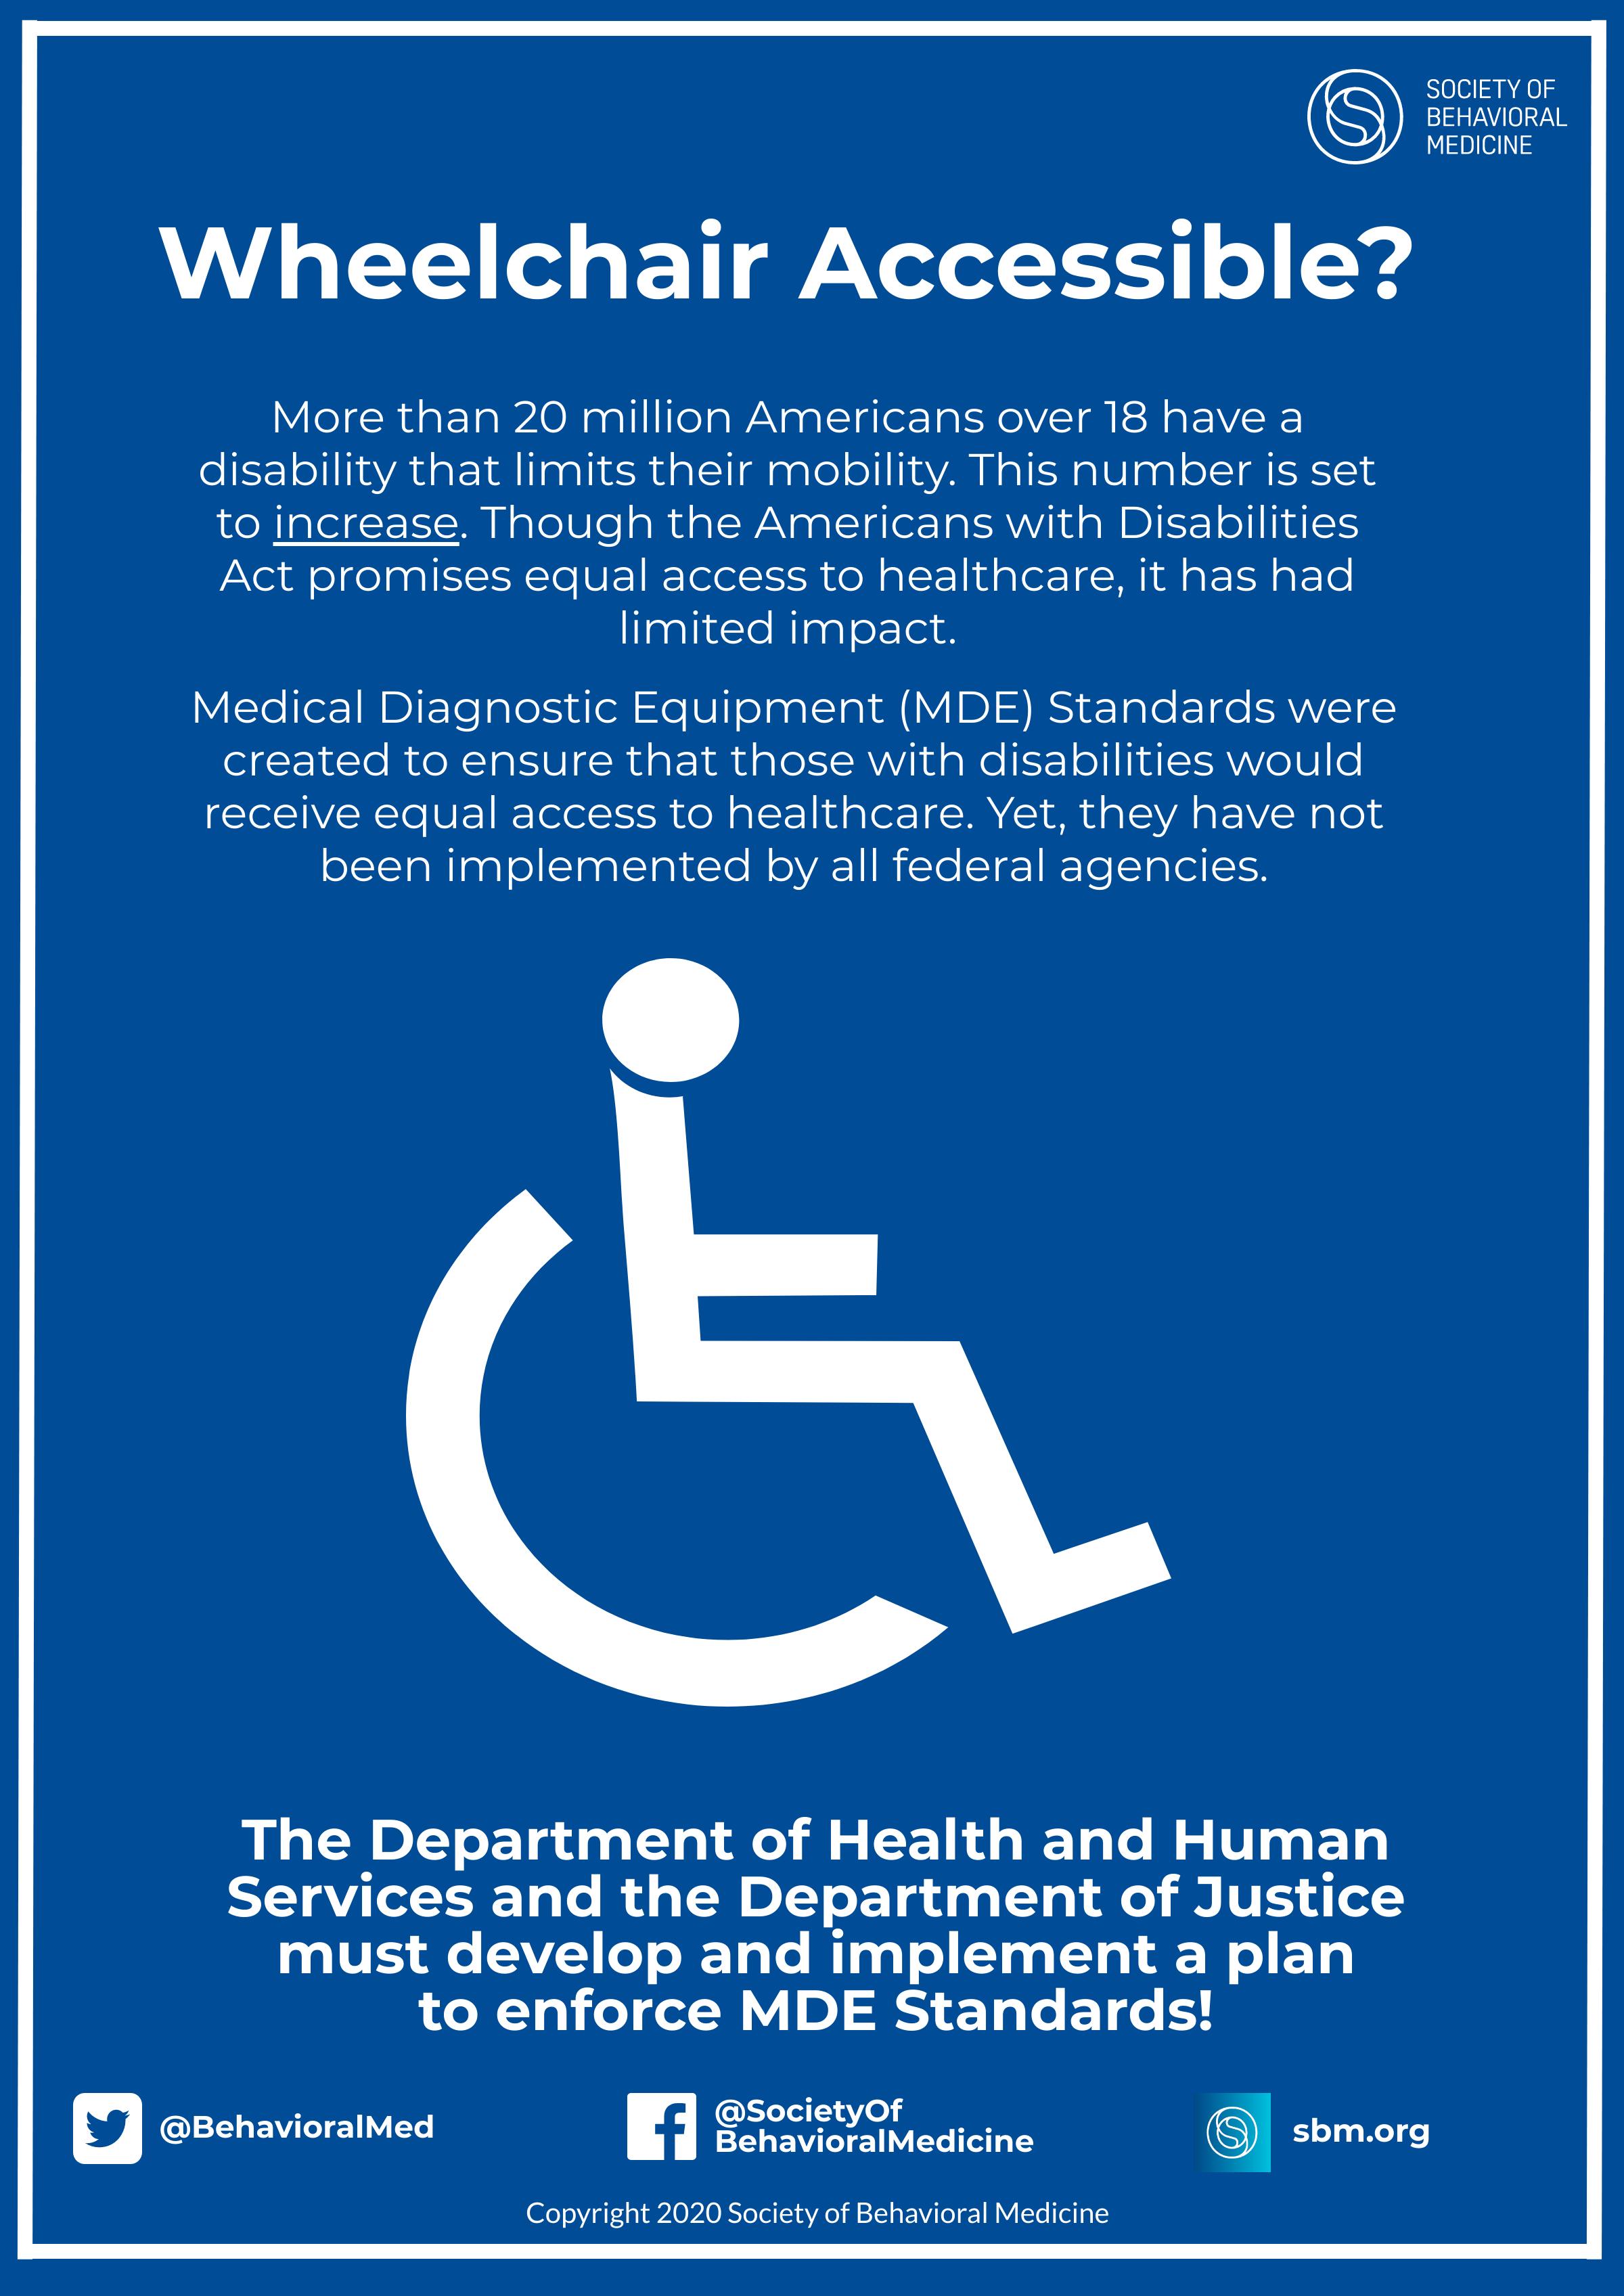 Healthcare Facilities Should Adopt Accessible Medical Diagnostic Equipment Standards